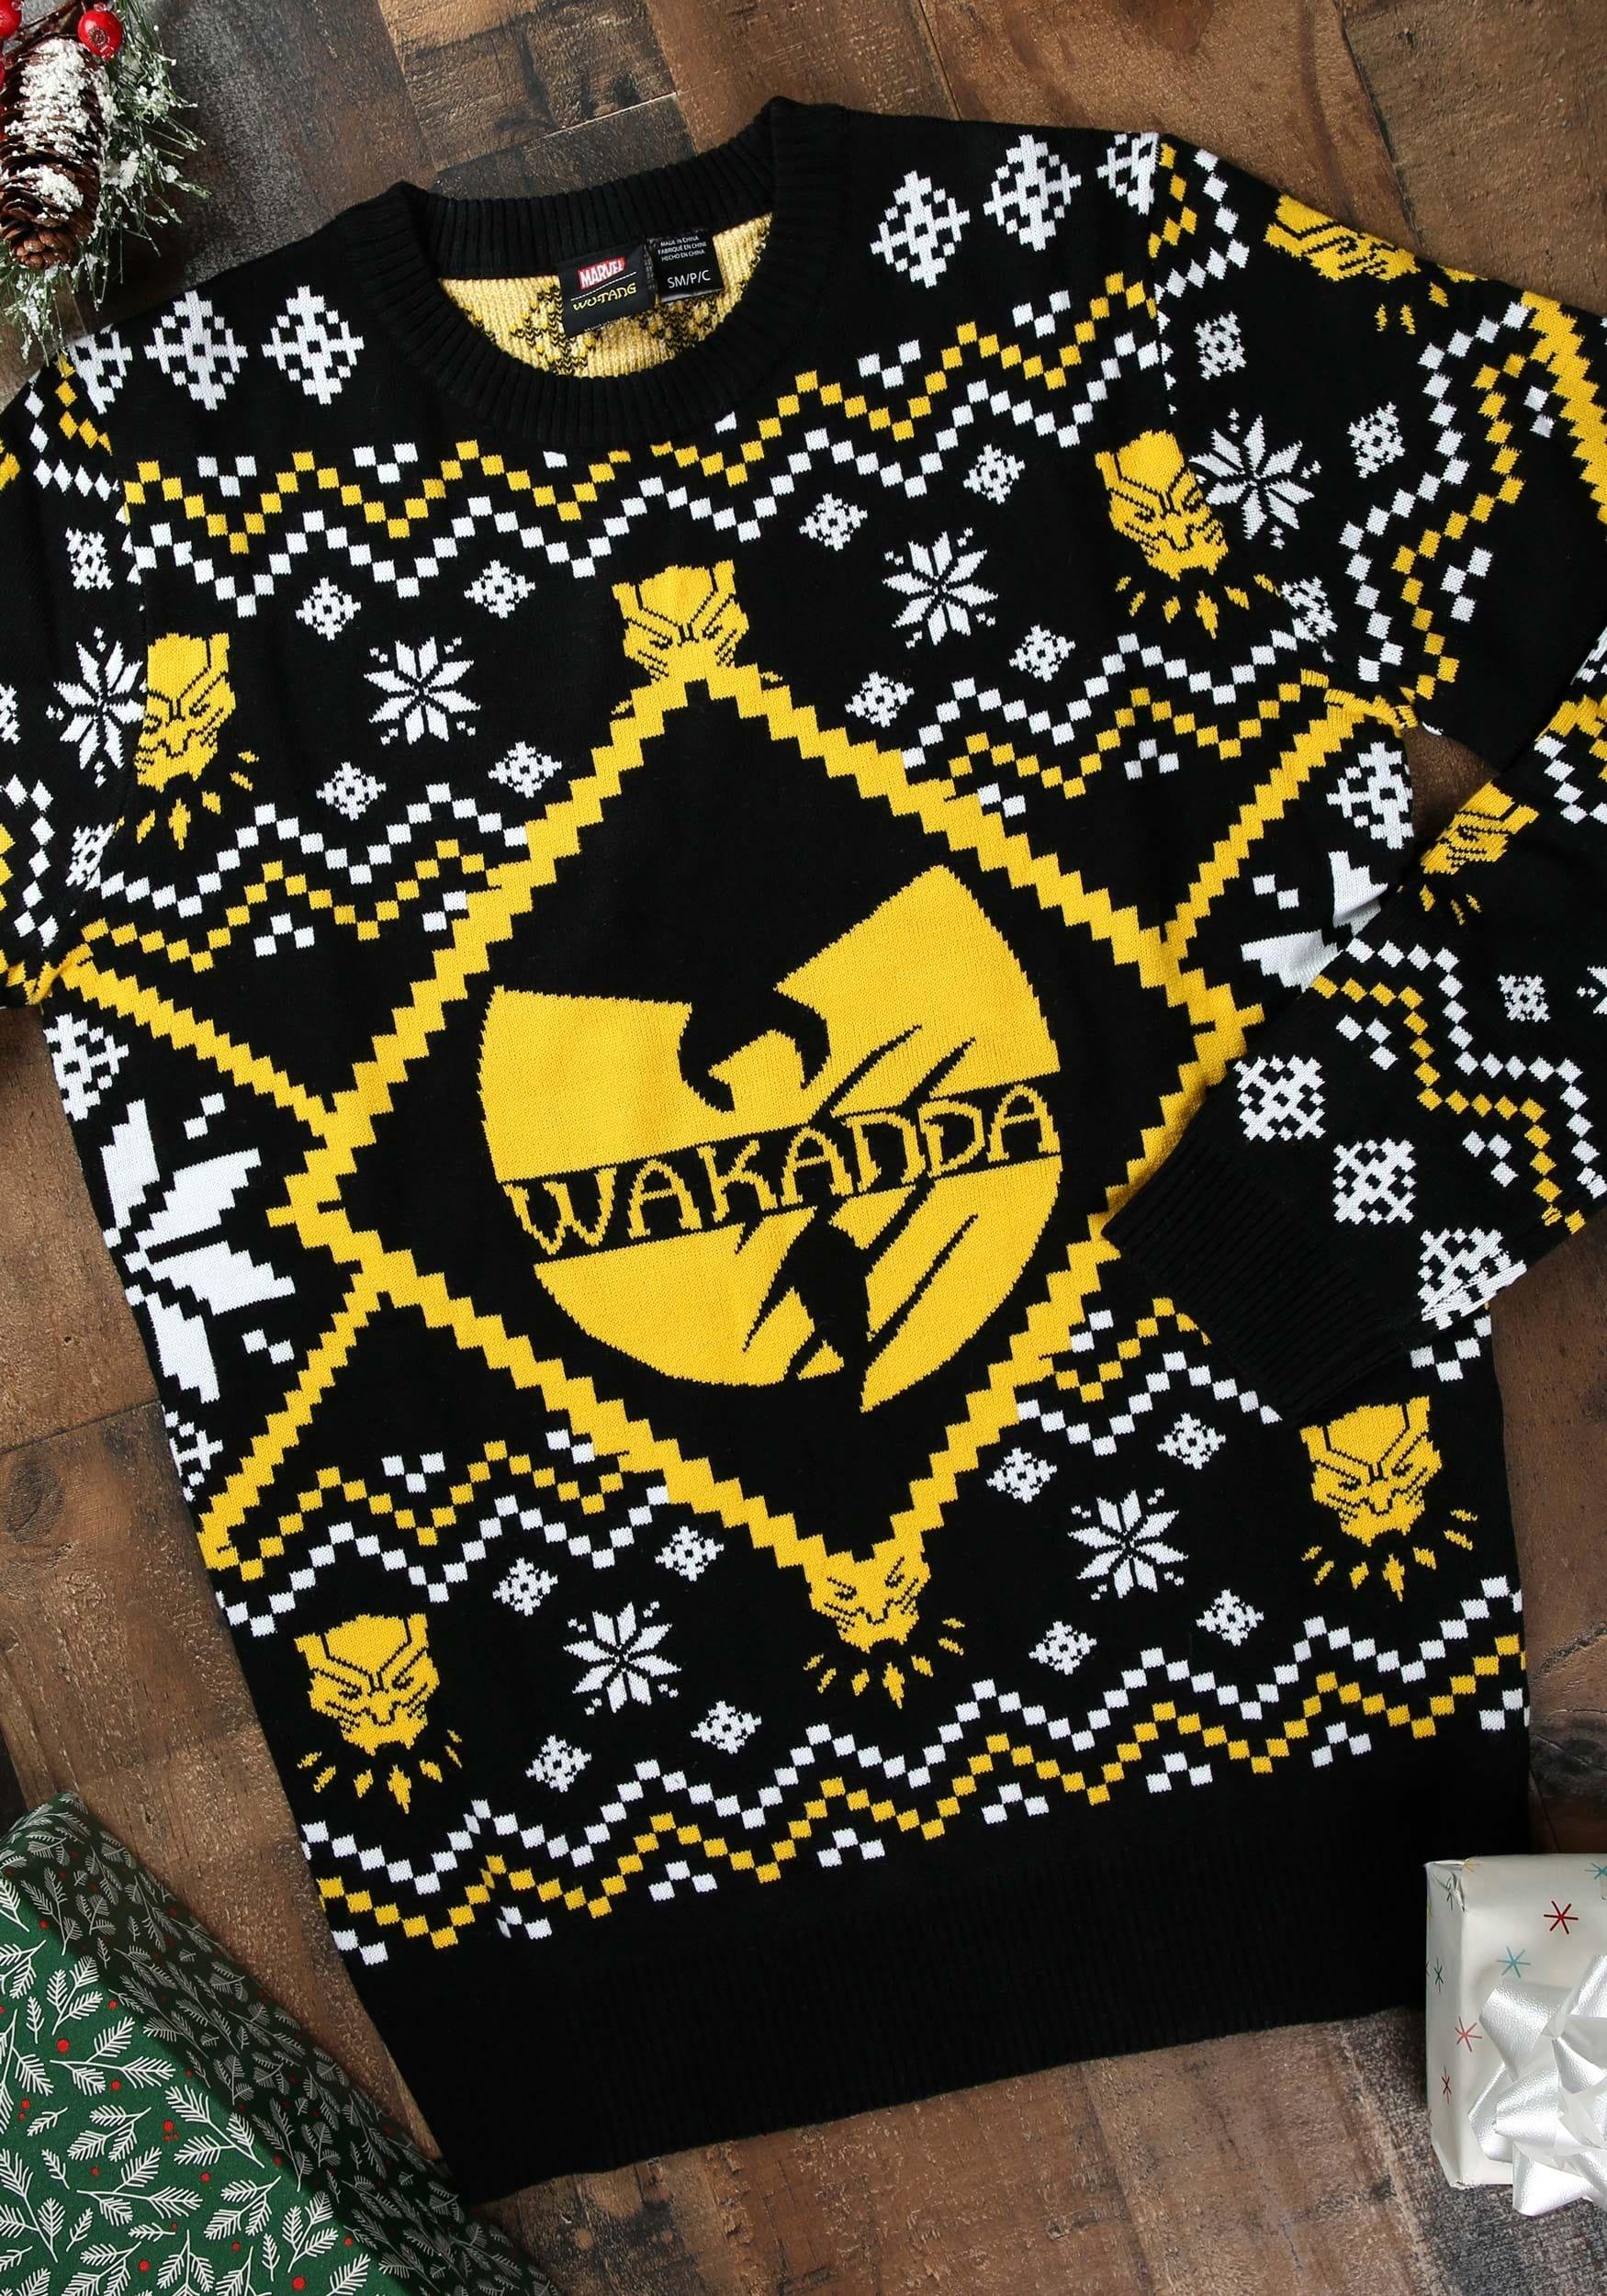 Superhero Ugly Christmas Sweaters.Black Panther Wakanda Intarsia Knit Ugly Christmas Sweater